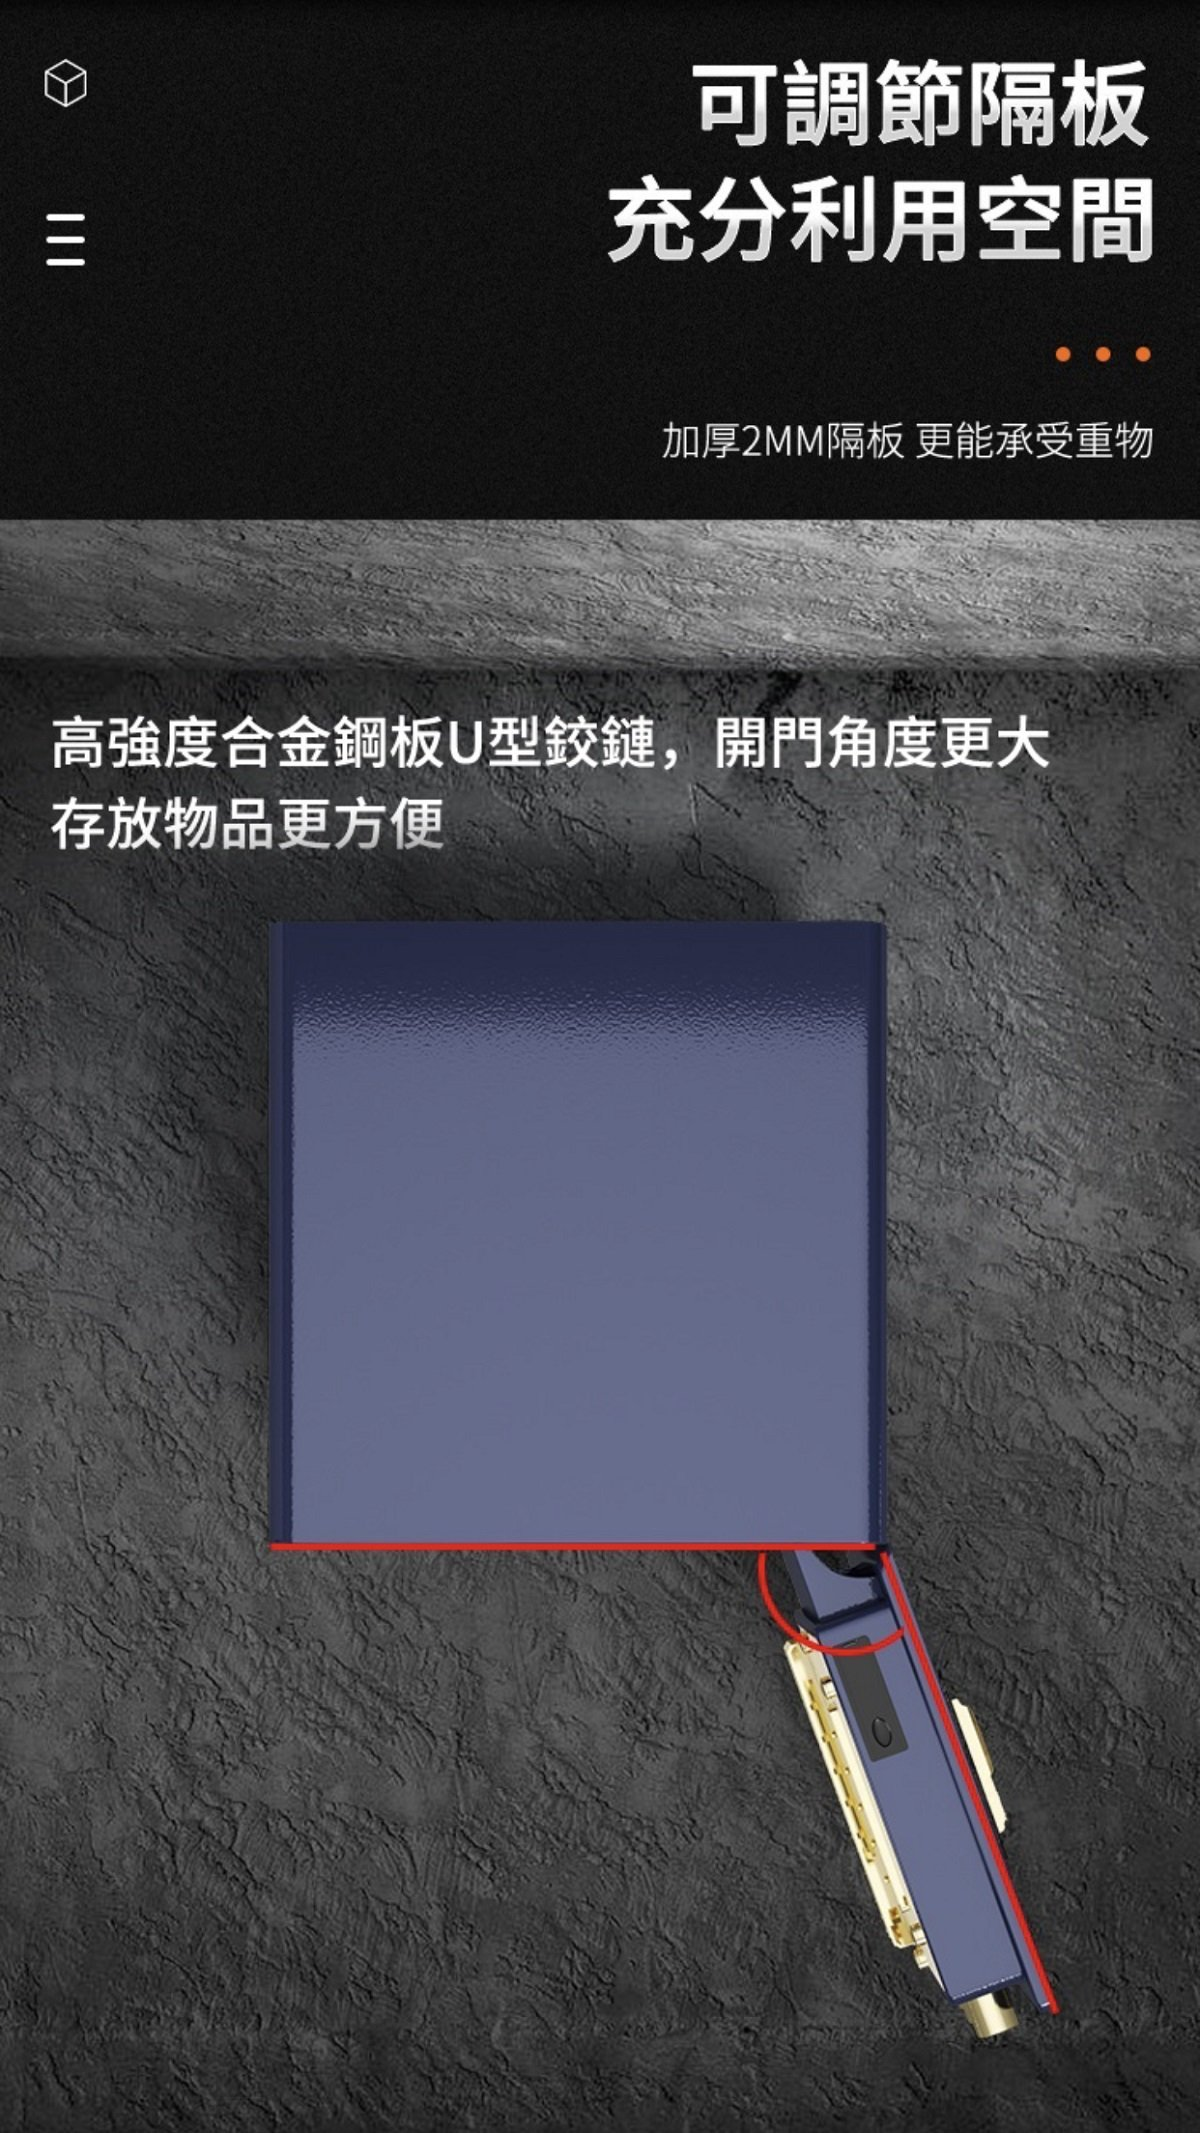 Marketing graphic-PB45-6